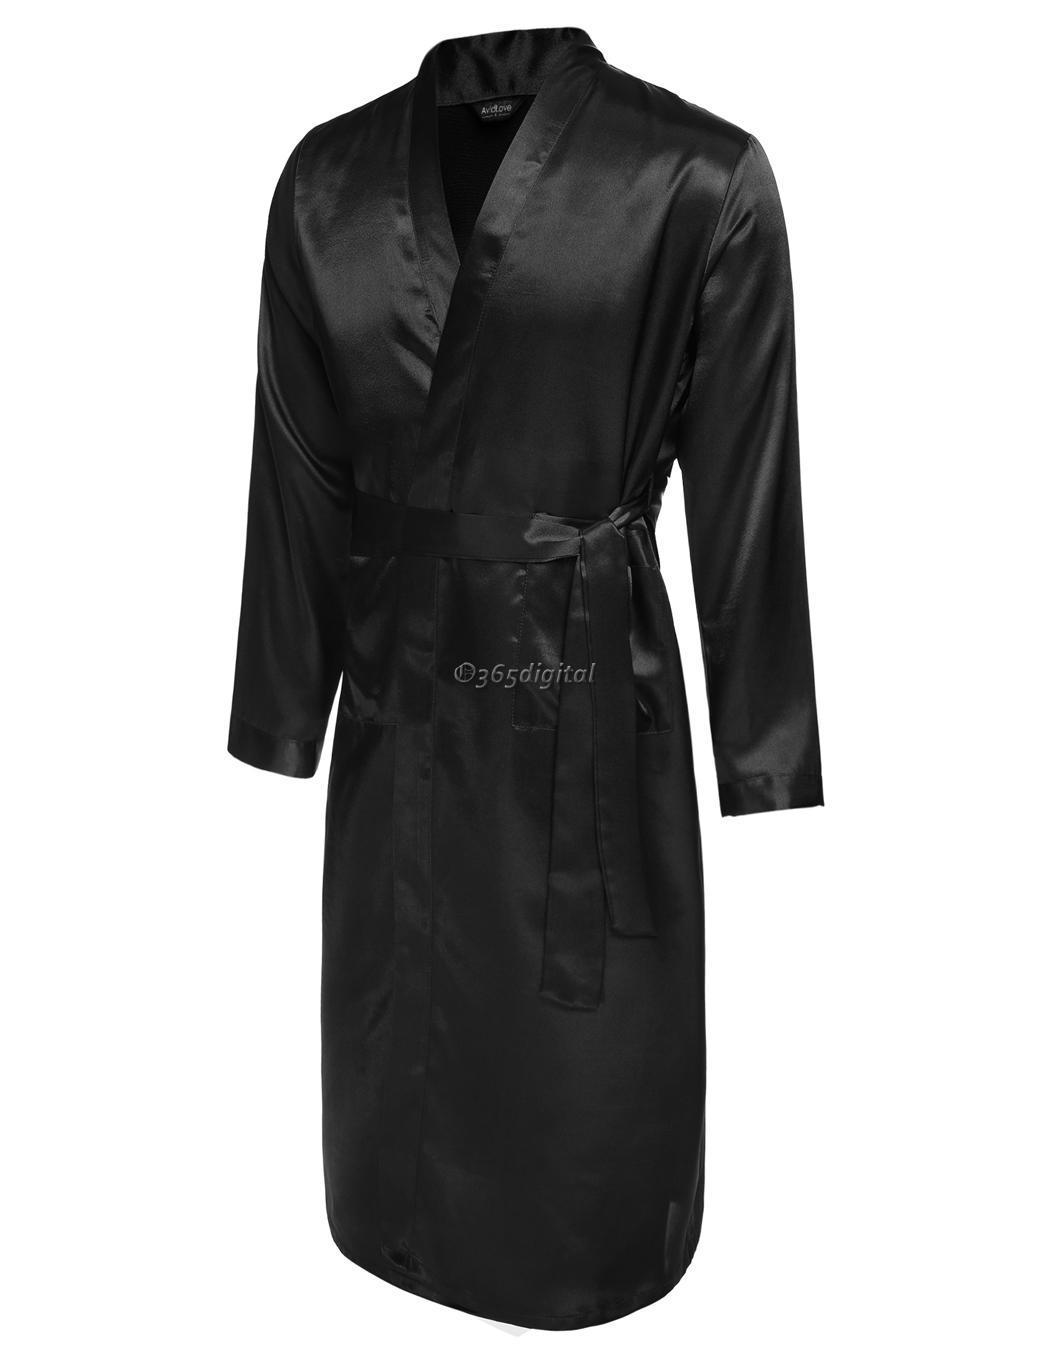 kimono bademantel herren avidlove bademantel schlafanz ge leicht satin homewear ebay. Black Bedroom Furniture Sets. Home Design Ideas